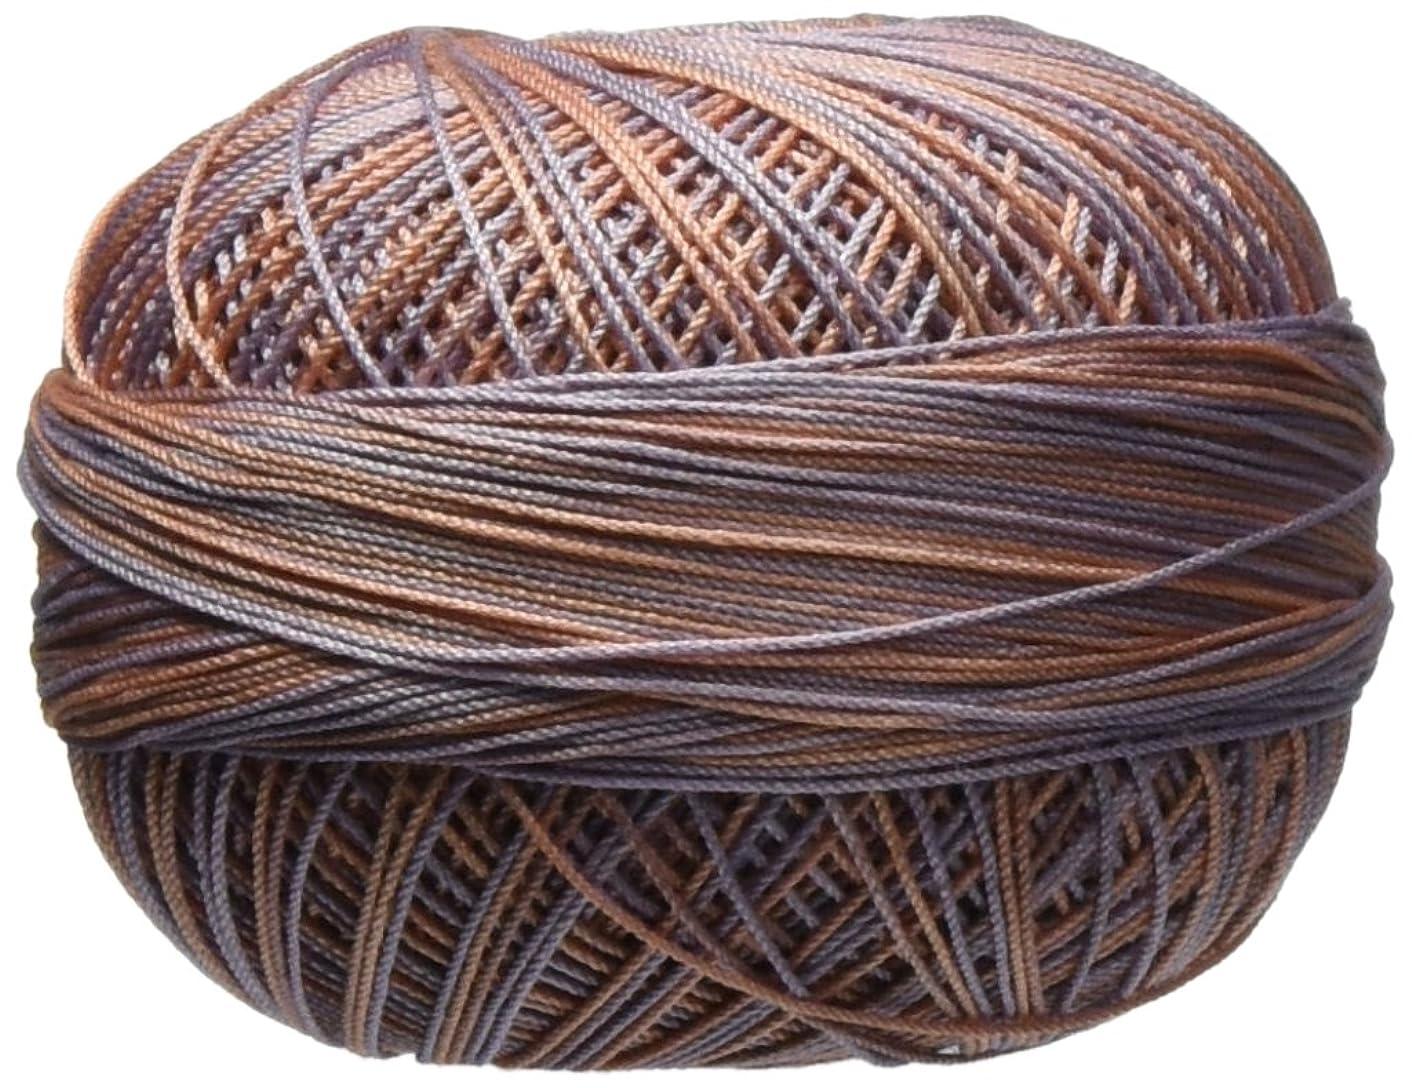 Handy Hands 210-Yard Lizbeth Cotton Thread, 25gm, Sea Shells ejqtltbl70546484